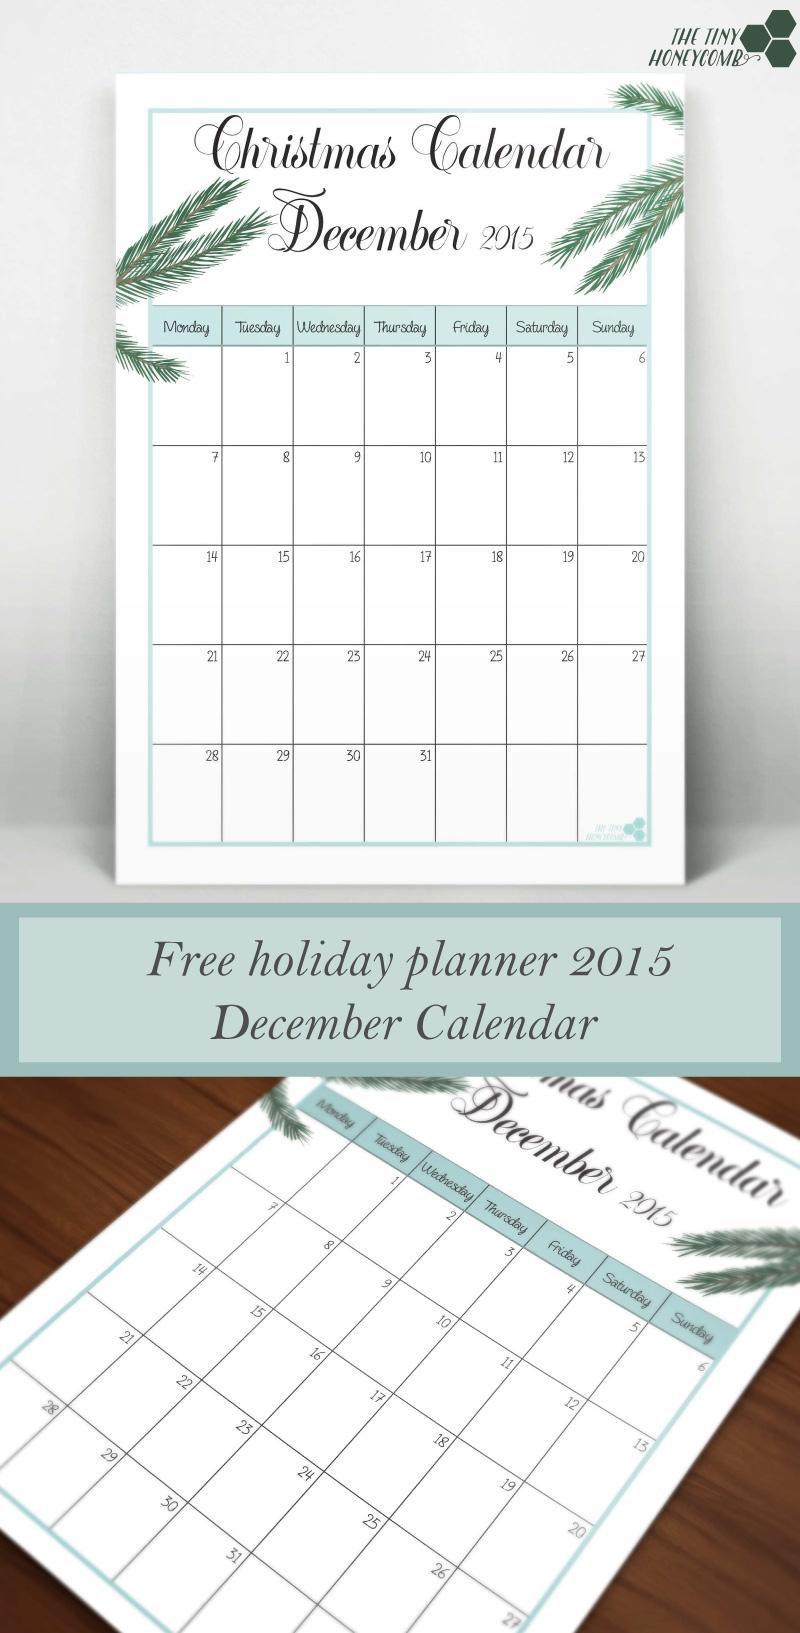 December Calendar. Free Christmas planner 2015